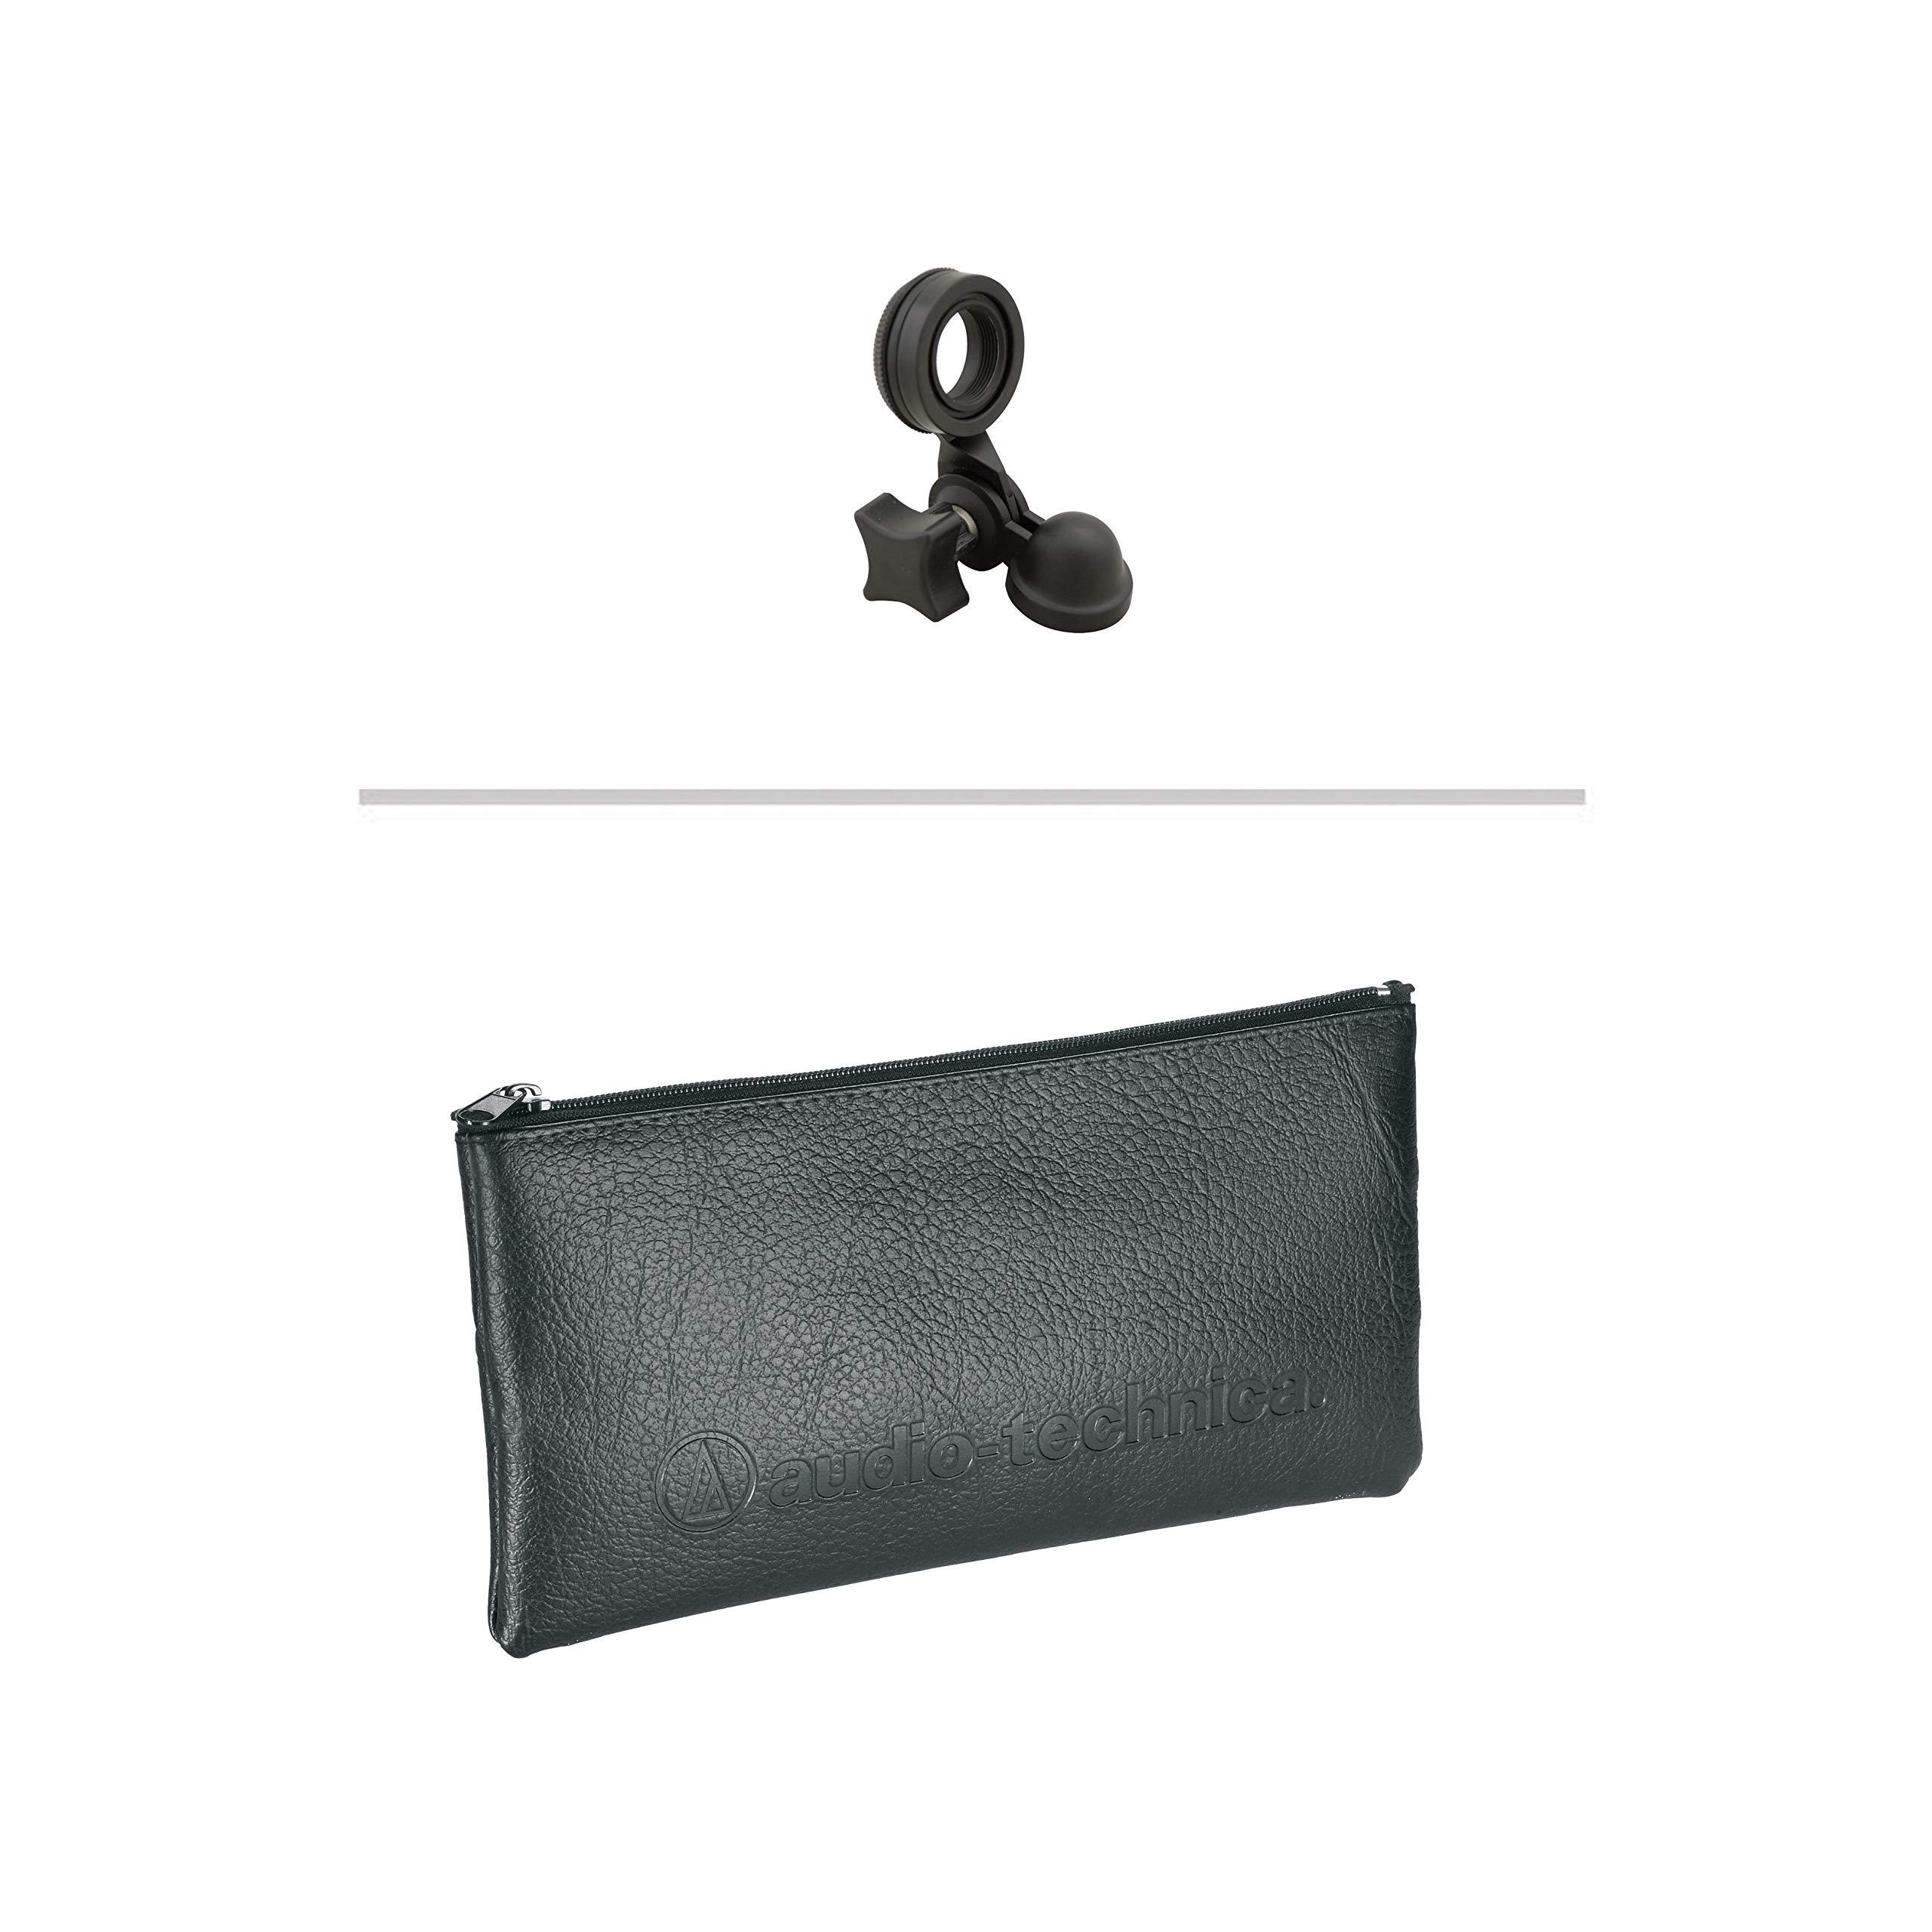 Audio-Technica AT2020 Cardioid Condenser Studio XLR Microphone, Black by Audio-Technica (Image #4)